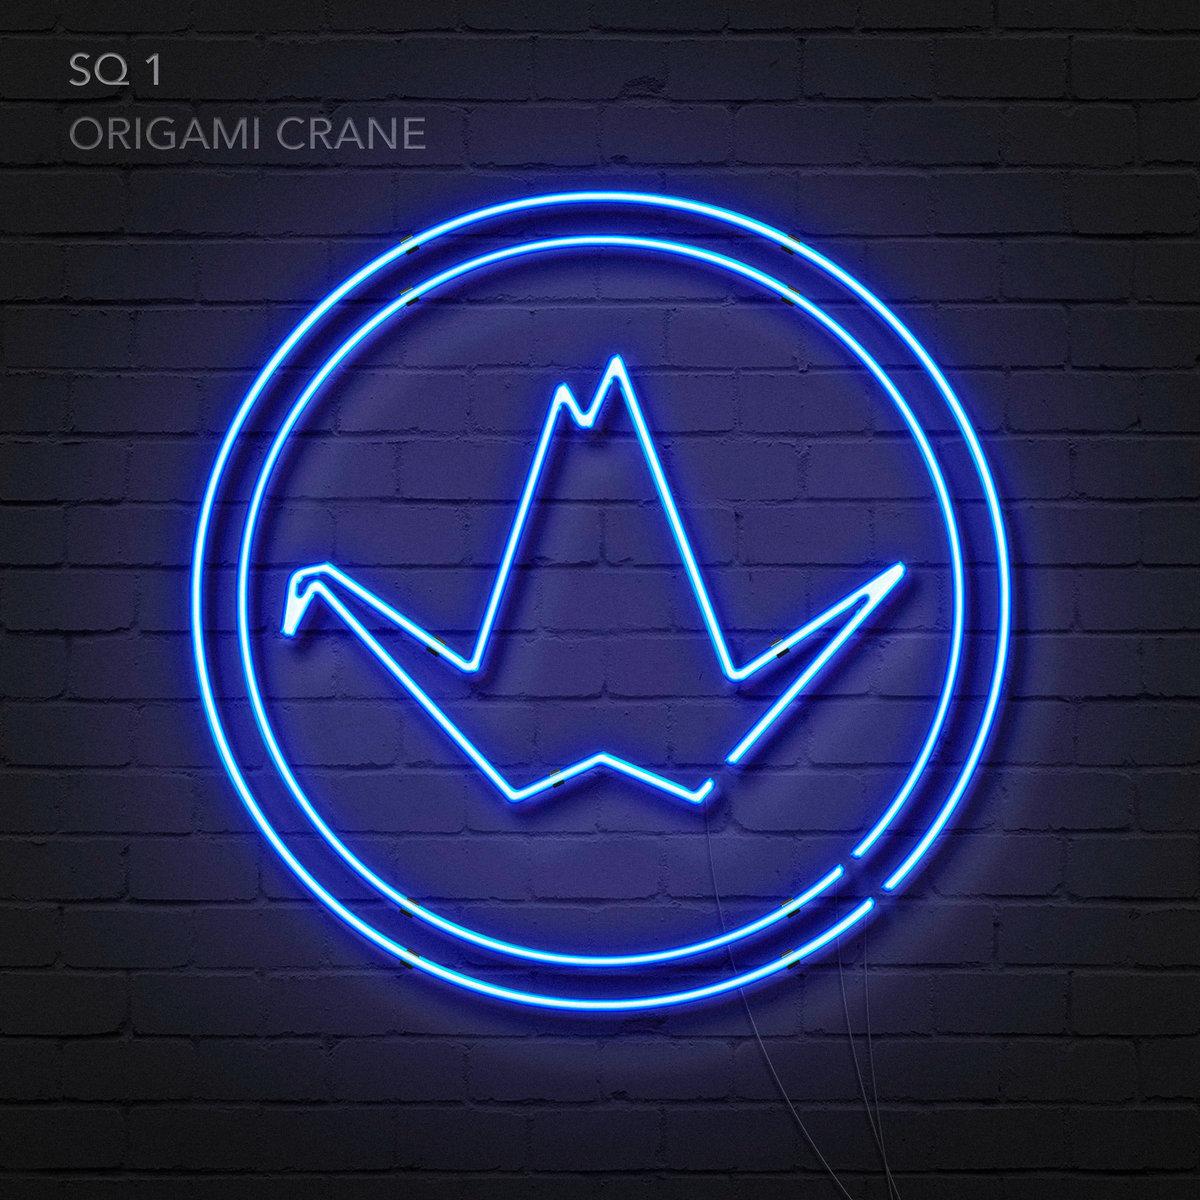 SQ 1 by Origami Crane